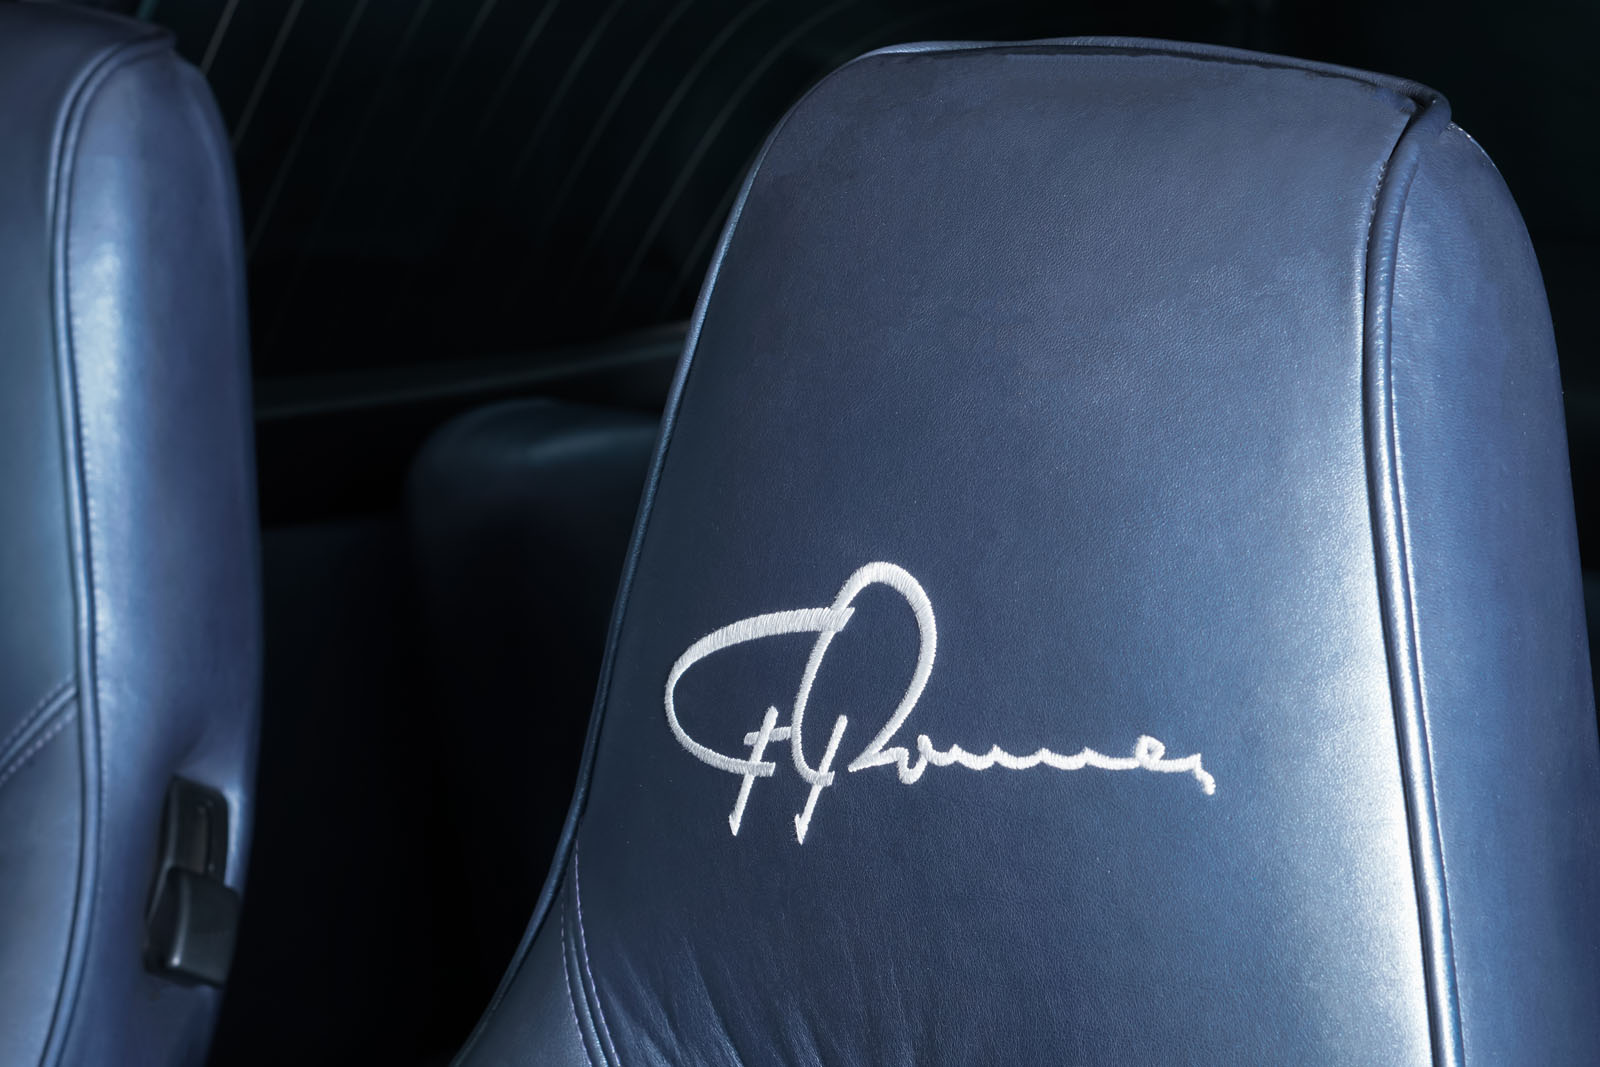 Porsche_911_Targa_Diamantblaumetallic_Blau_POR-0092_11_w